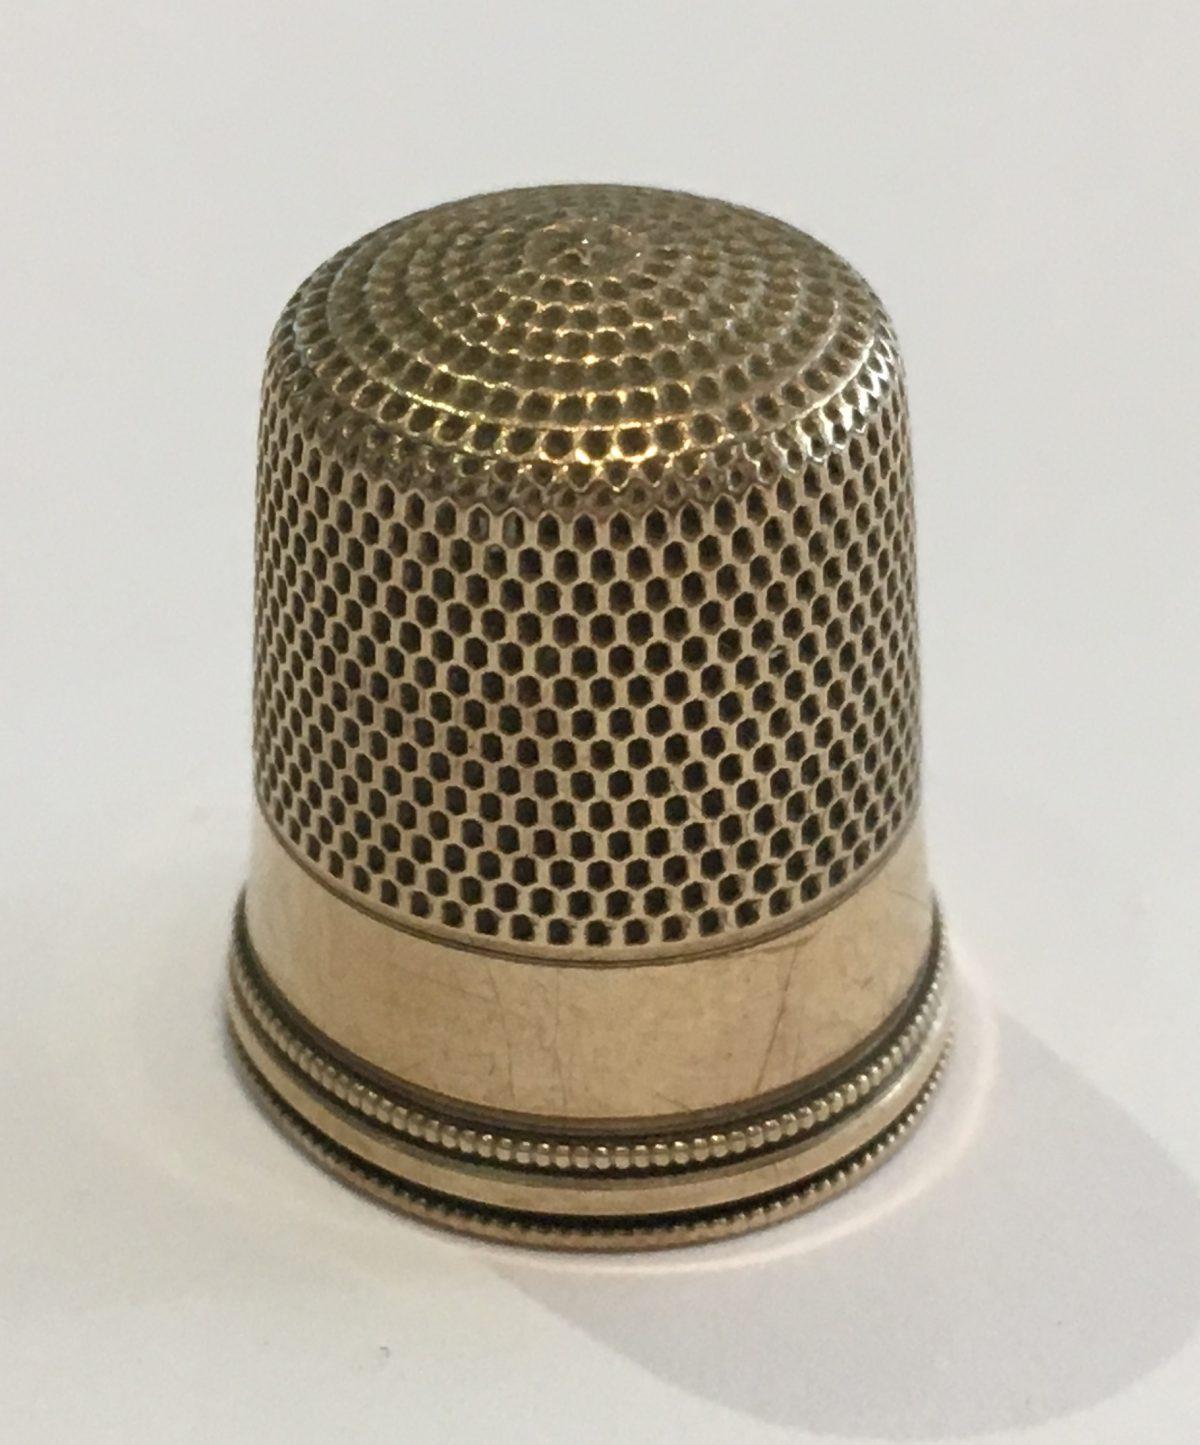 10k Yellow Gold Vintage Thimble 3.3 grams